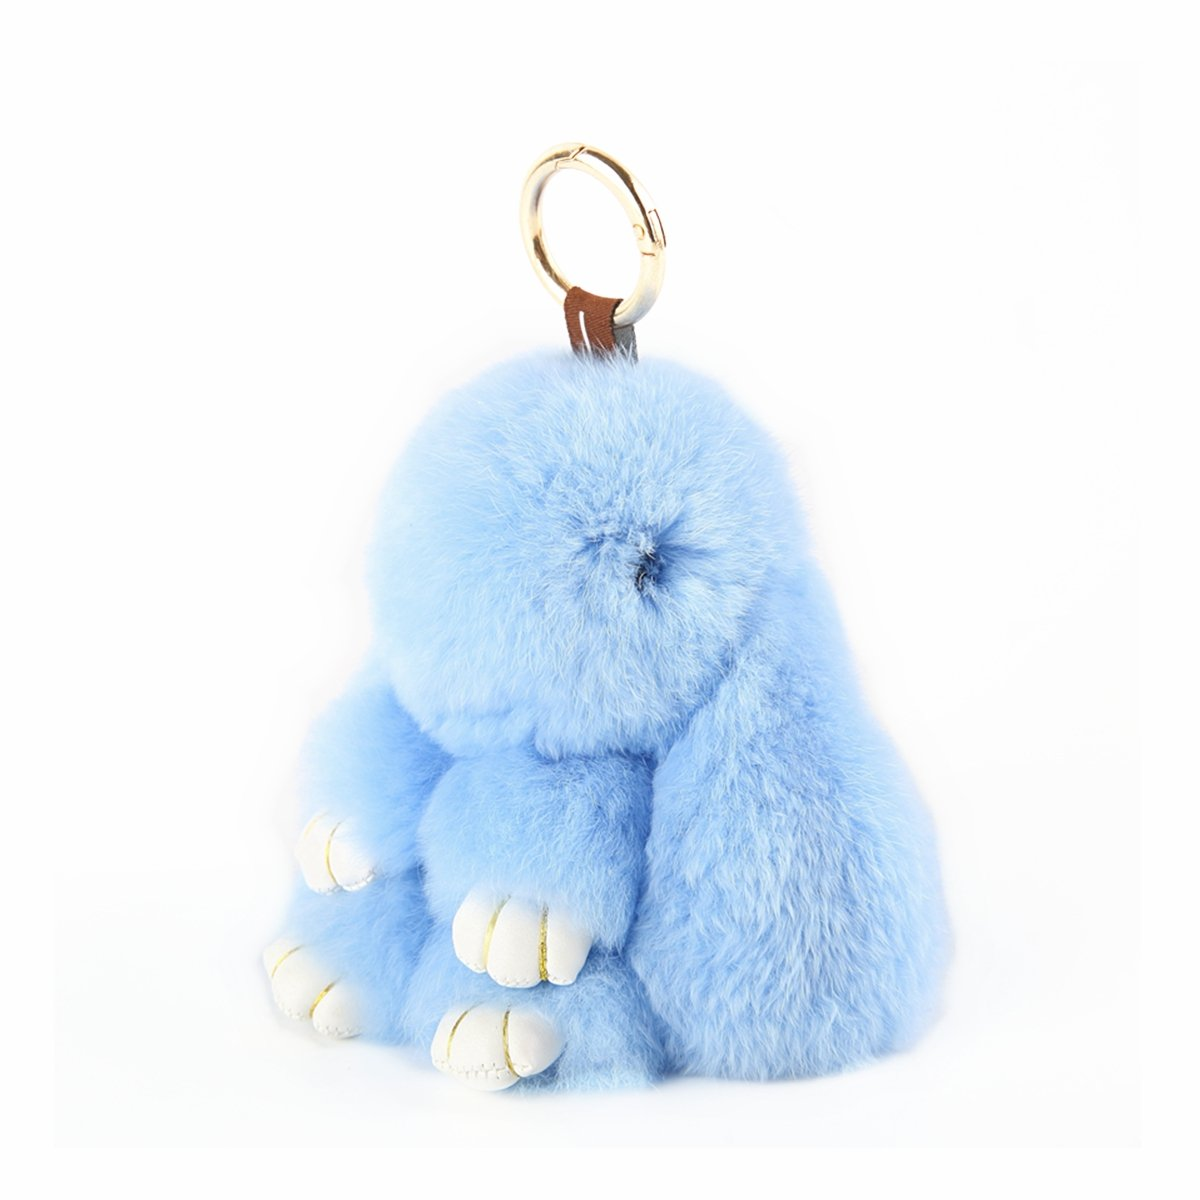 YISEVEN(イセブン) バッグチャームキーリング 可愛いウサギ型ぬいぐるみ バッグ/キーホルダー/室内/自動車などの飾り ふわふわファー付きヌイグルミ プレゼントお祝い ブルー B01MZB0VDW ブルー ブルー